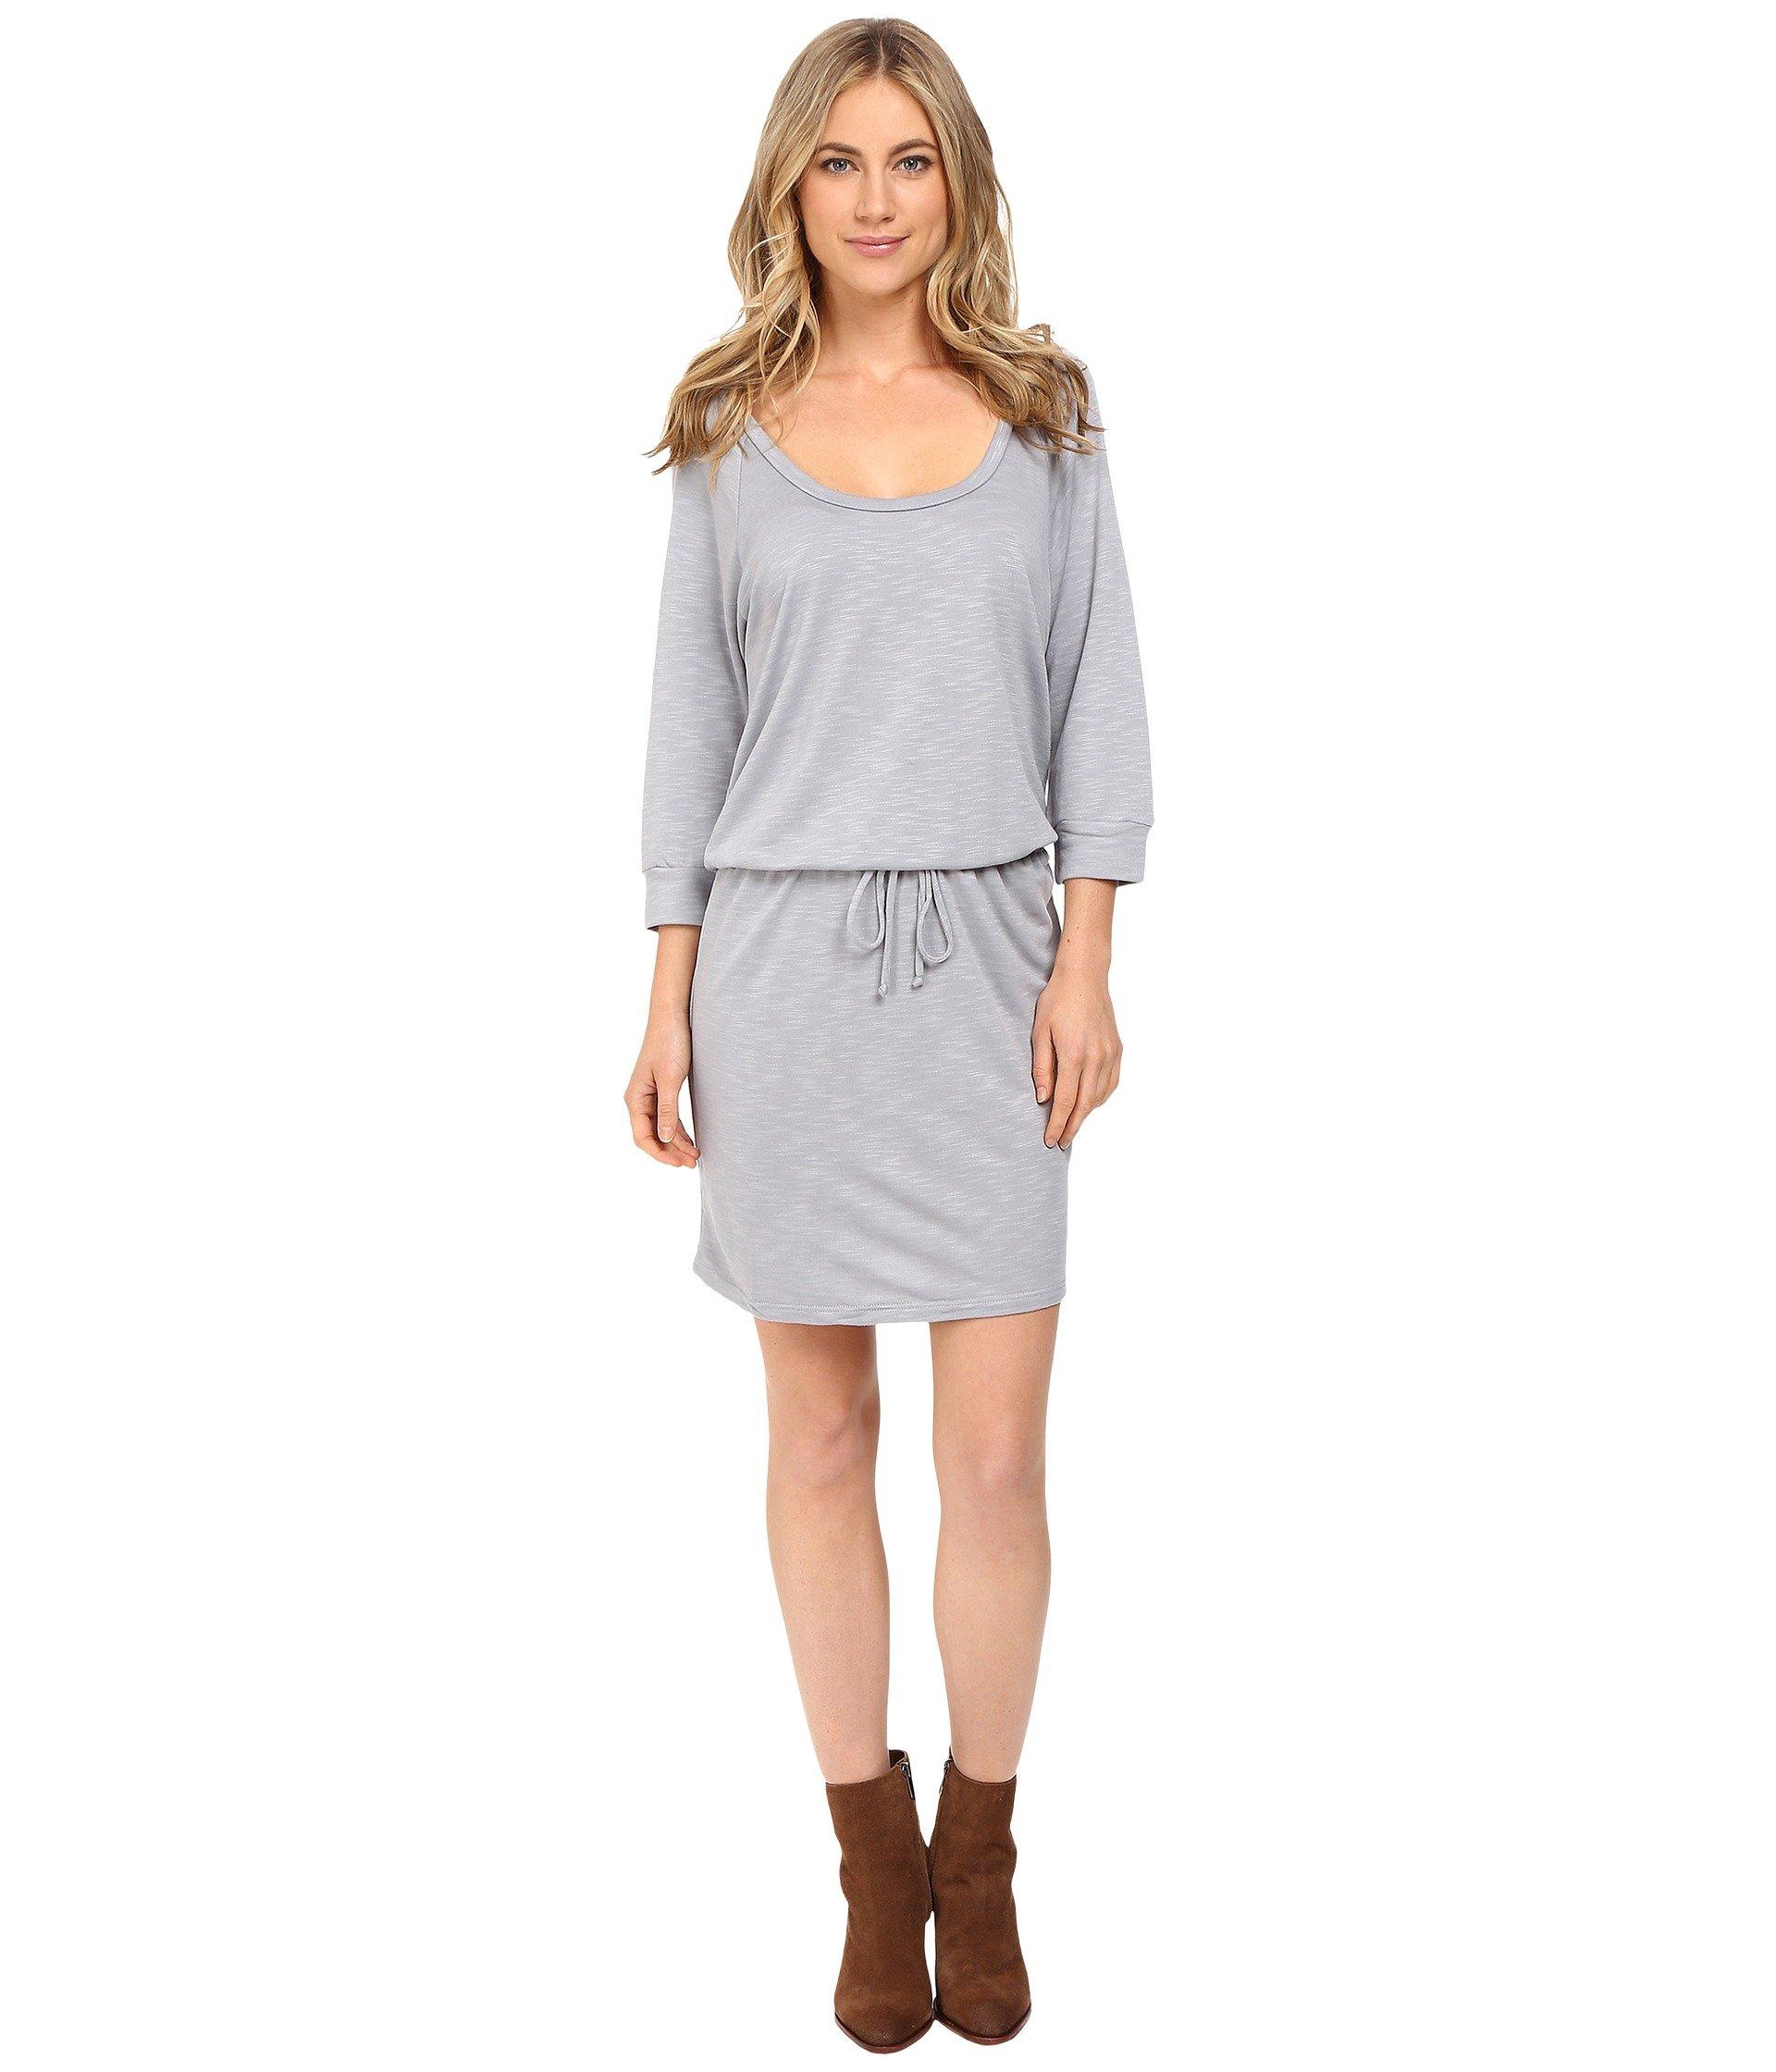 Lanston Scoop Mini Dress